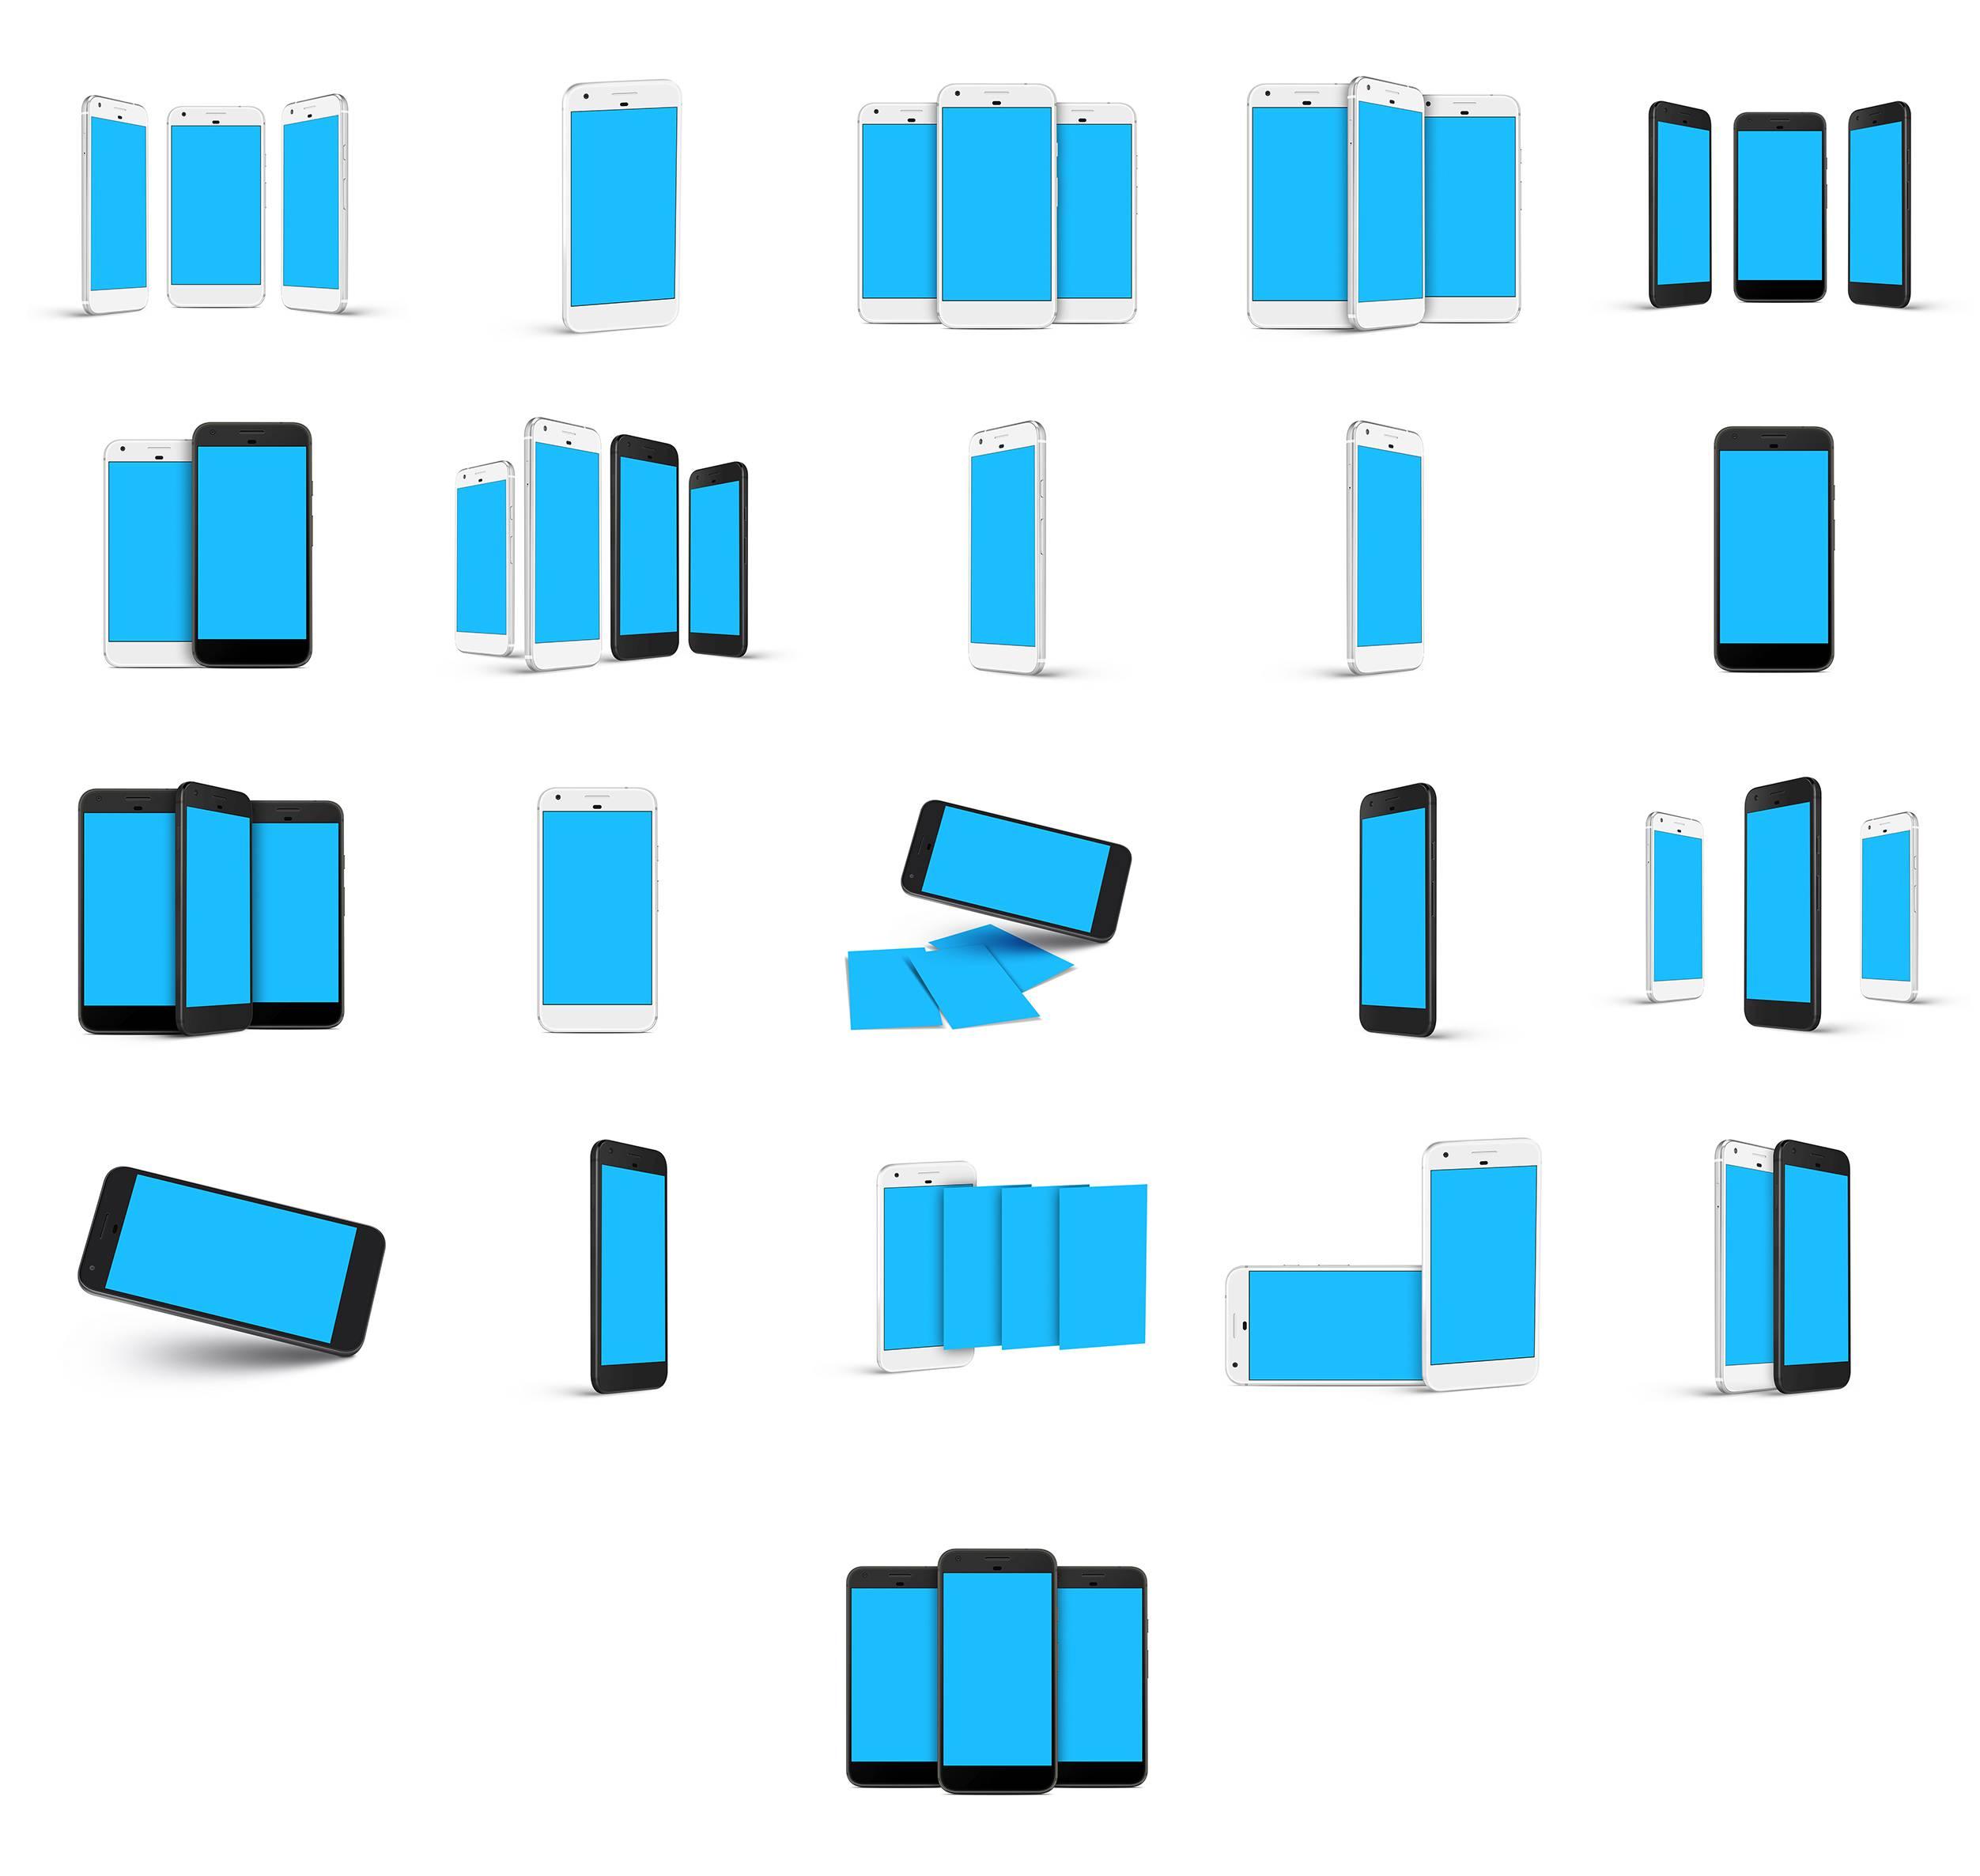 Google Pixel黑白双色多角度安卓手机设备样机模型素材psd源文件